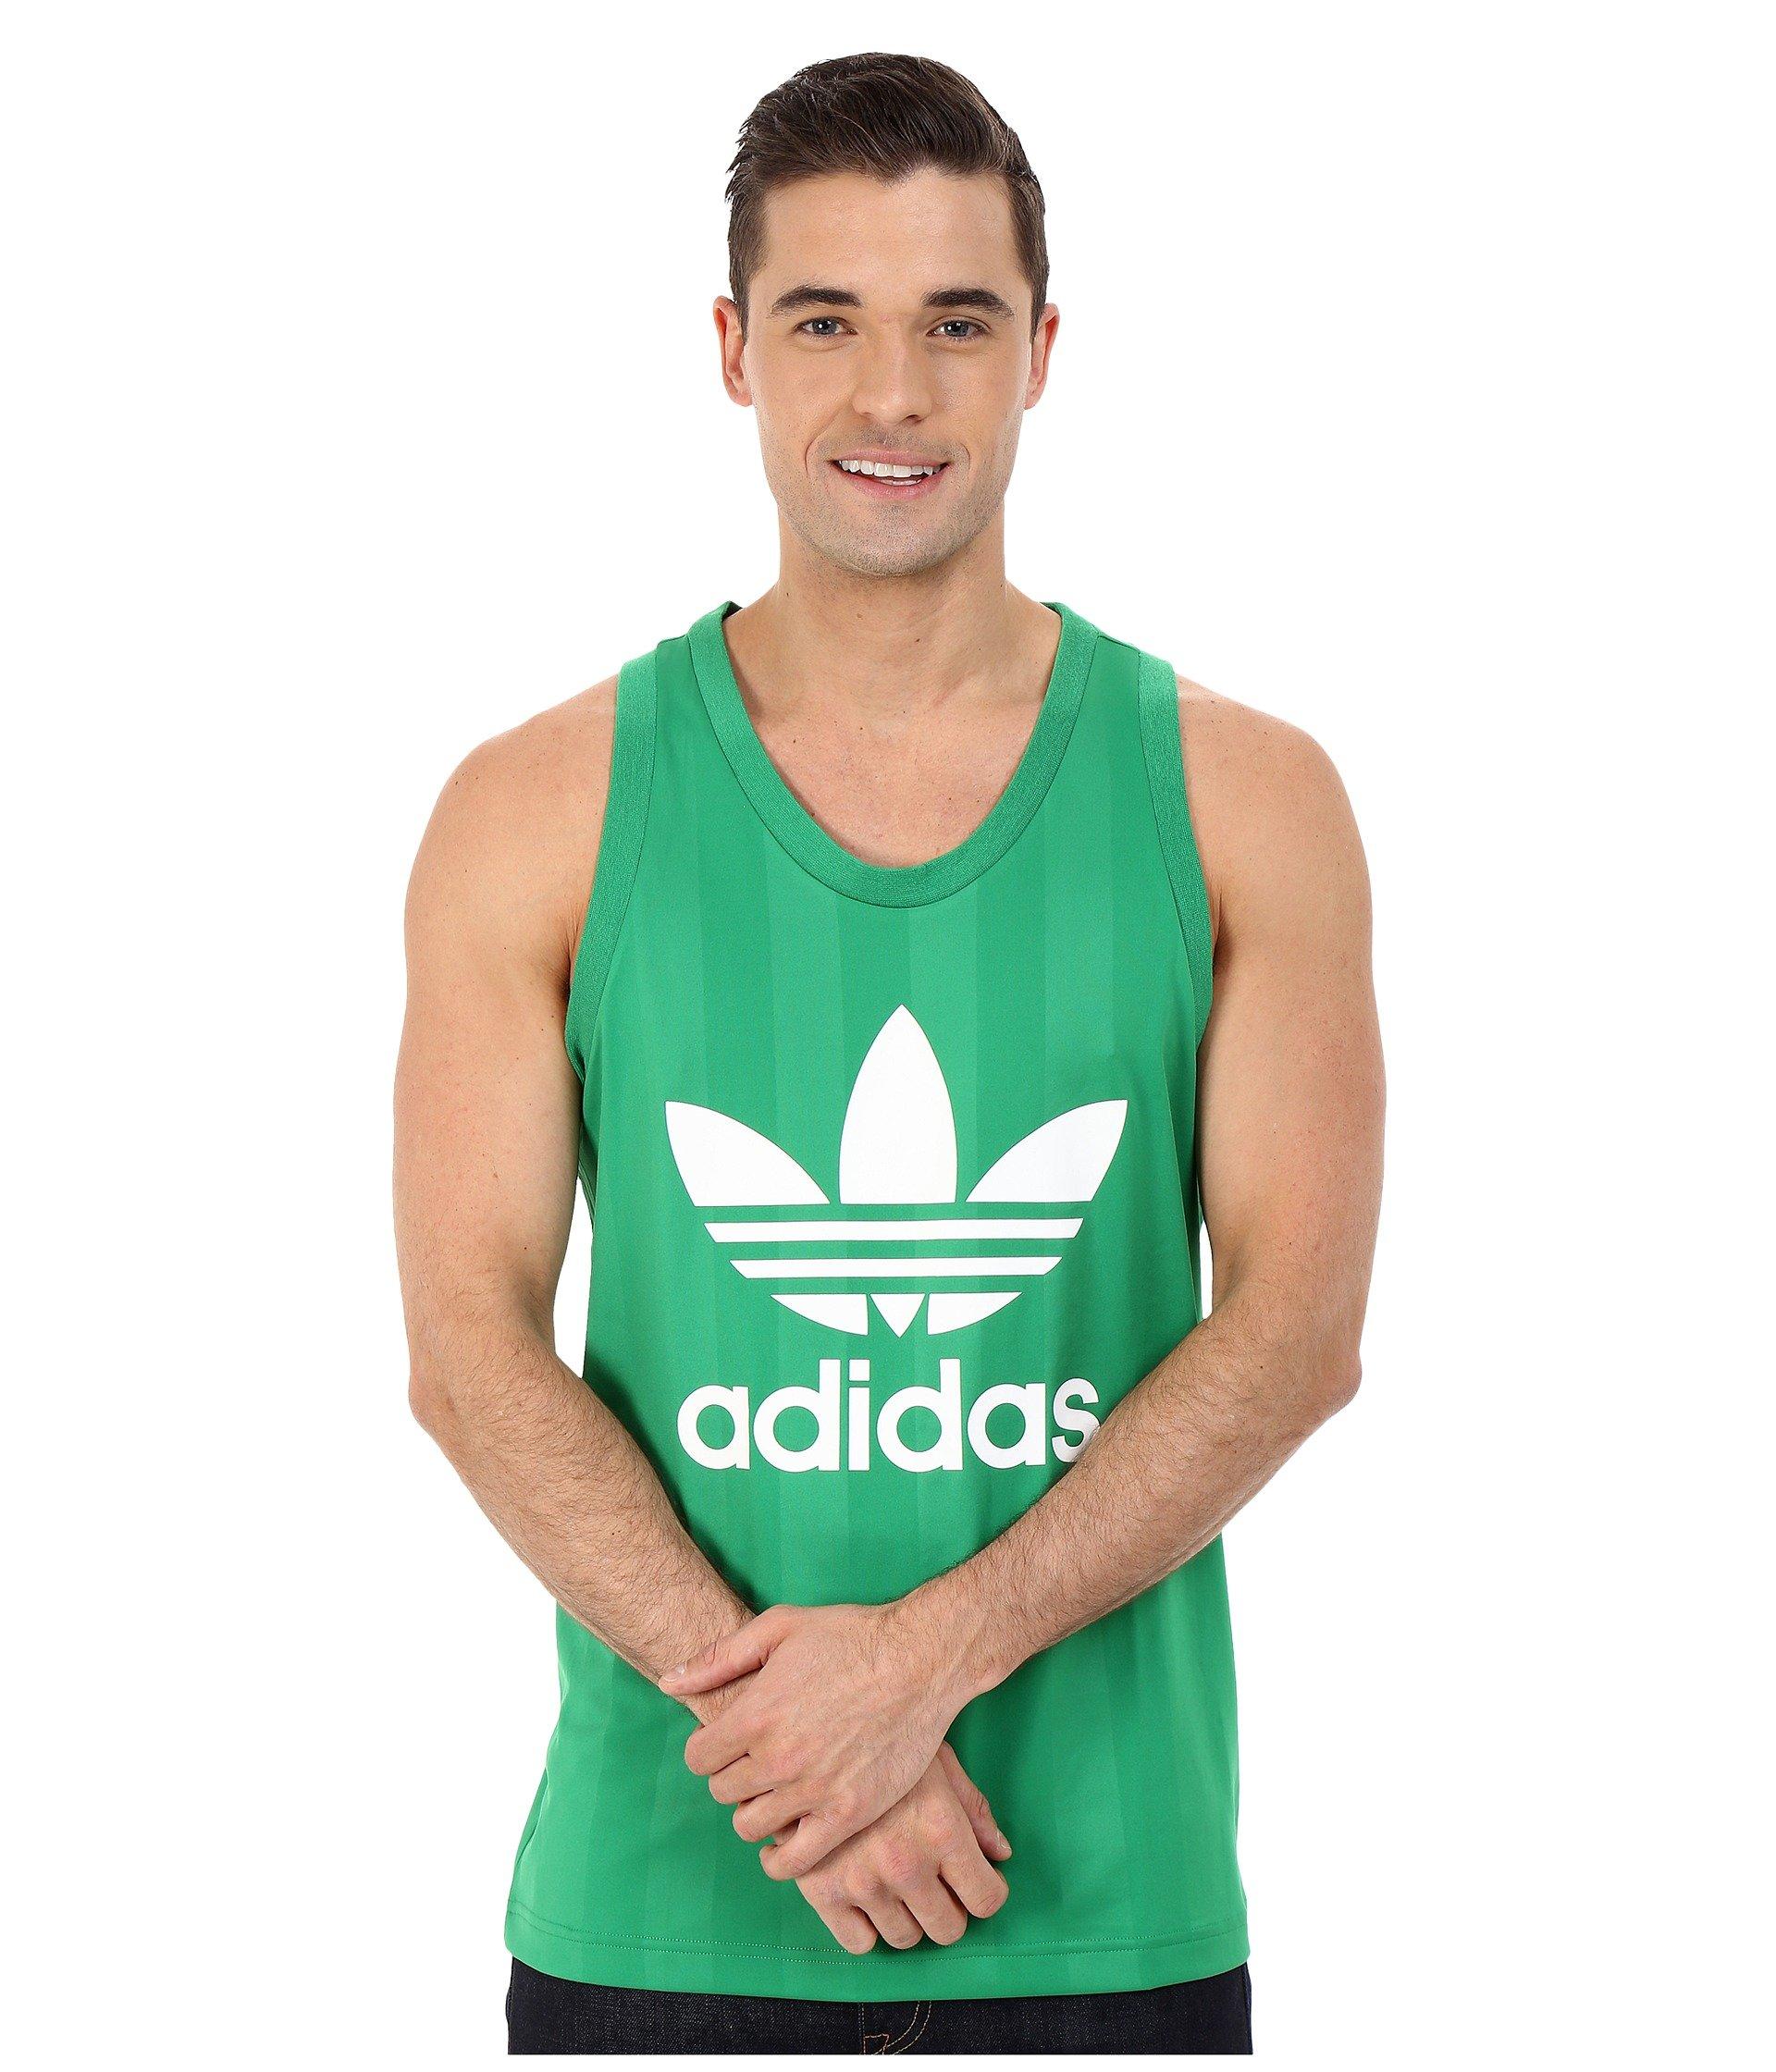 af67474ae56e0 Lyst - adidas Originals Trefoil Tank Top in Green for Men